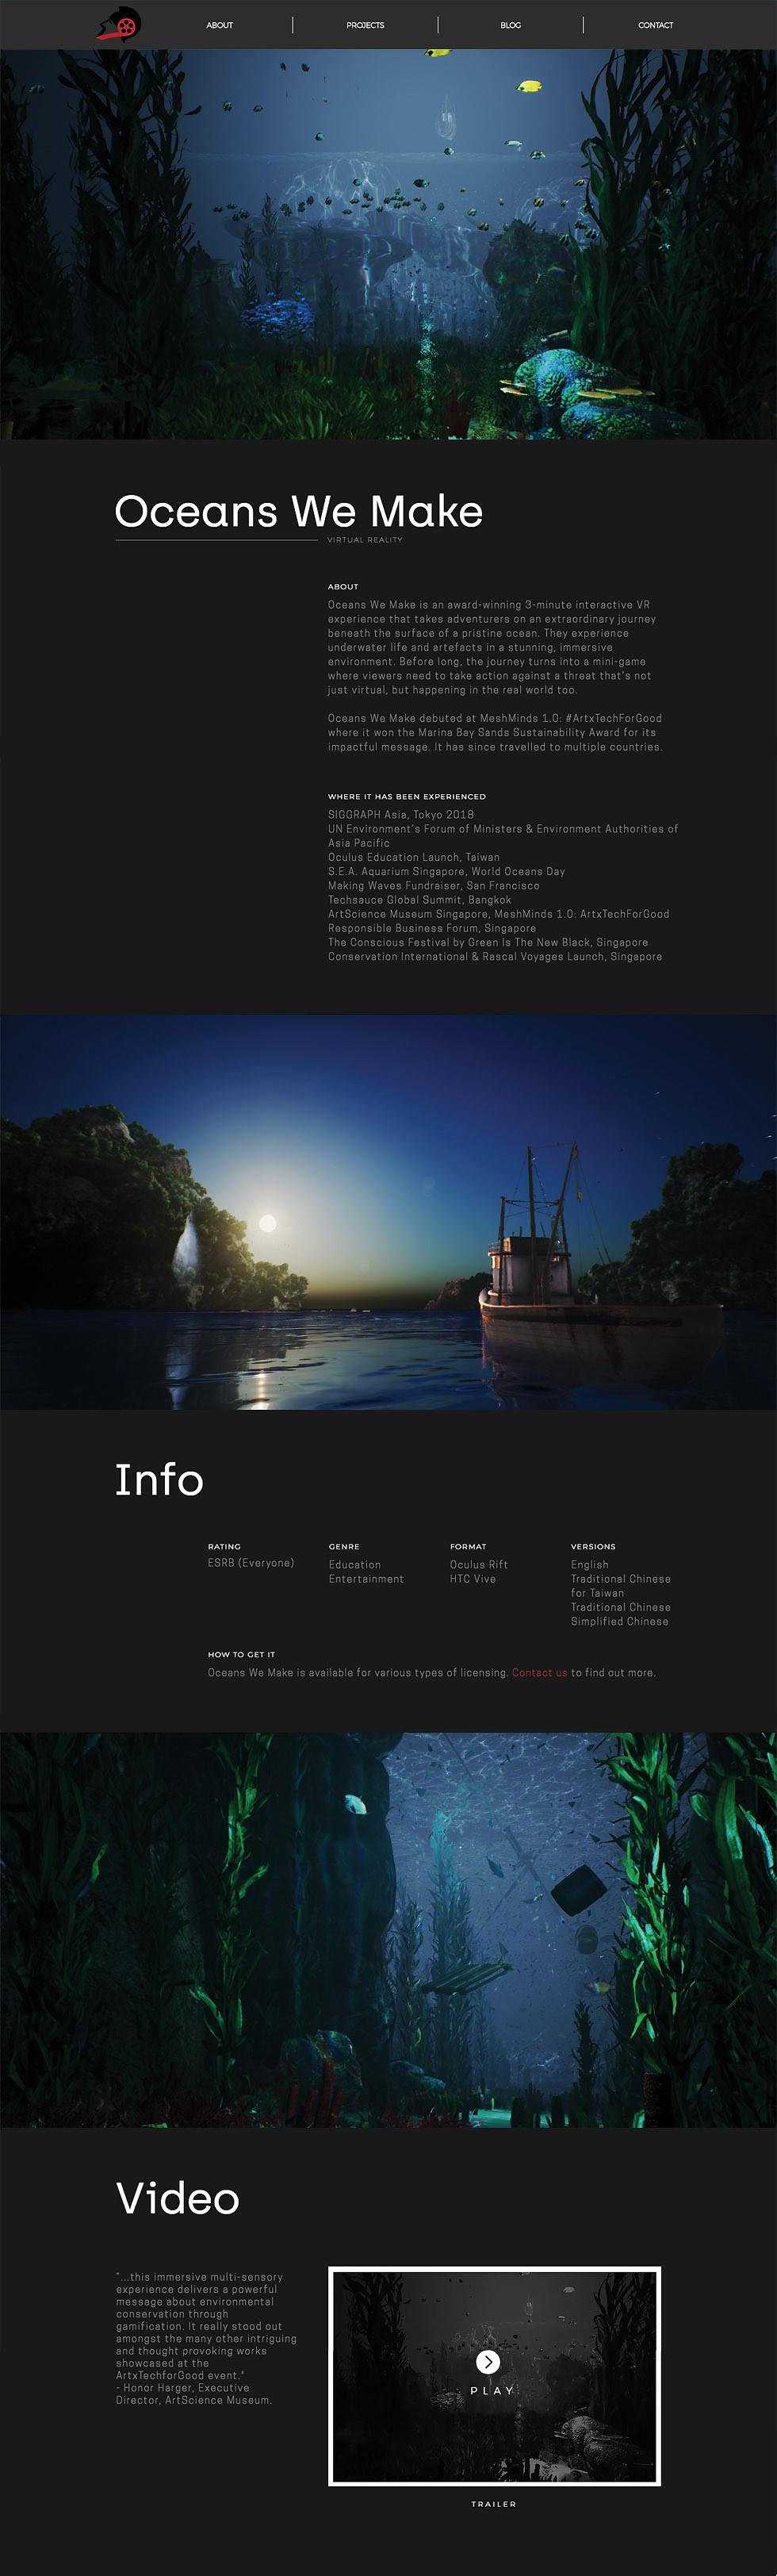 warrior9-vr-project-page-web-design.jpg